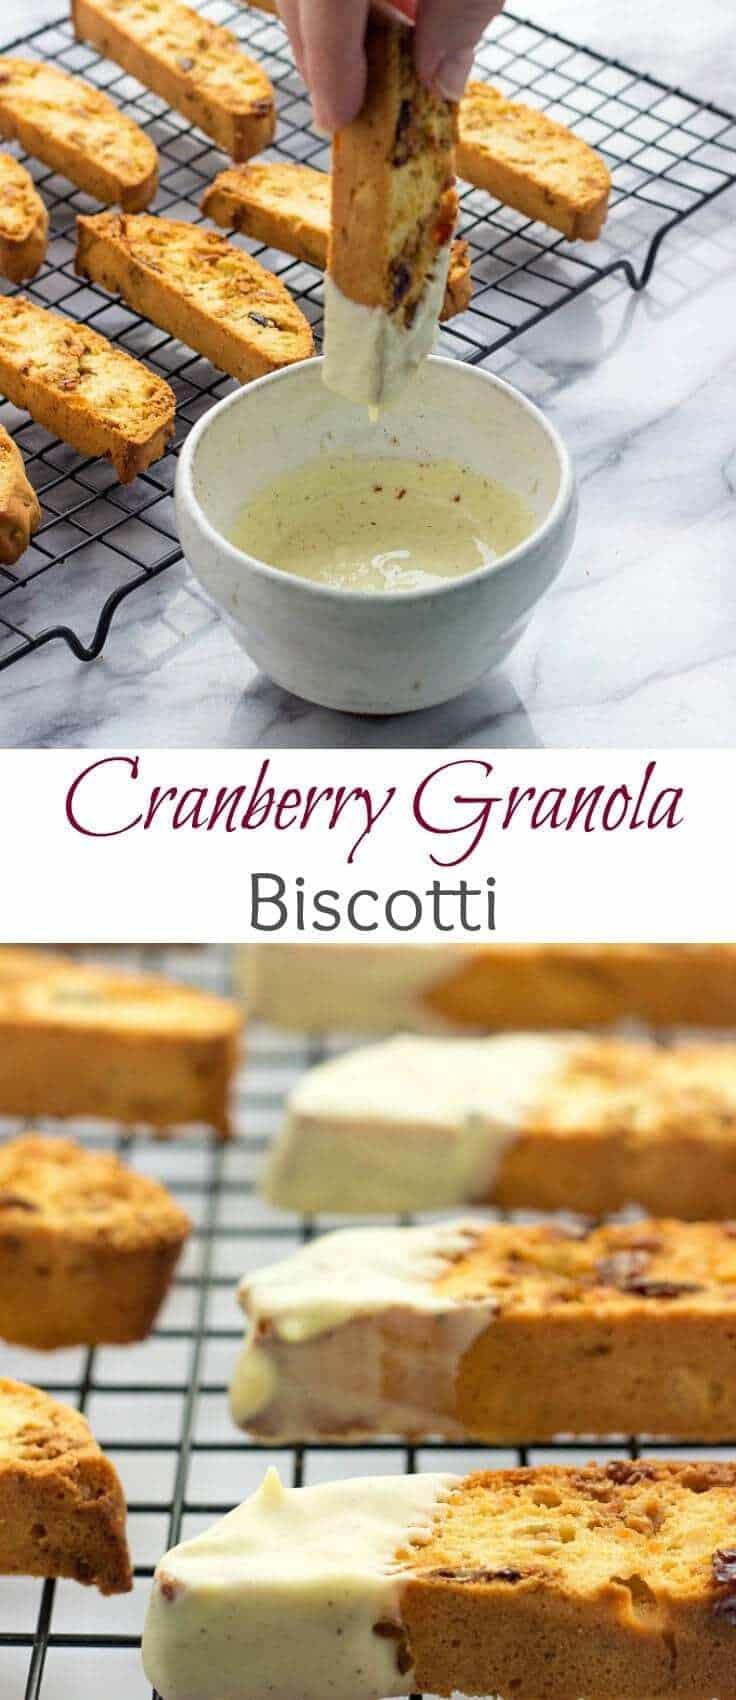 Cranberry Granola Biscotti   Cranberry Biscotti Recipe   Cranberry Biscotti With White Chocolate Dip   Cranberry Biscotti Recipe For Breakfast